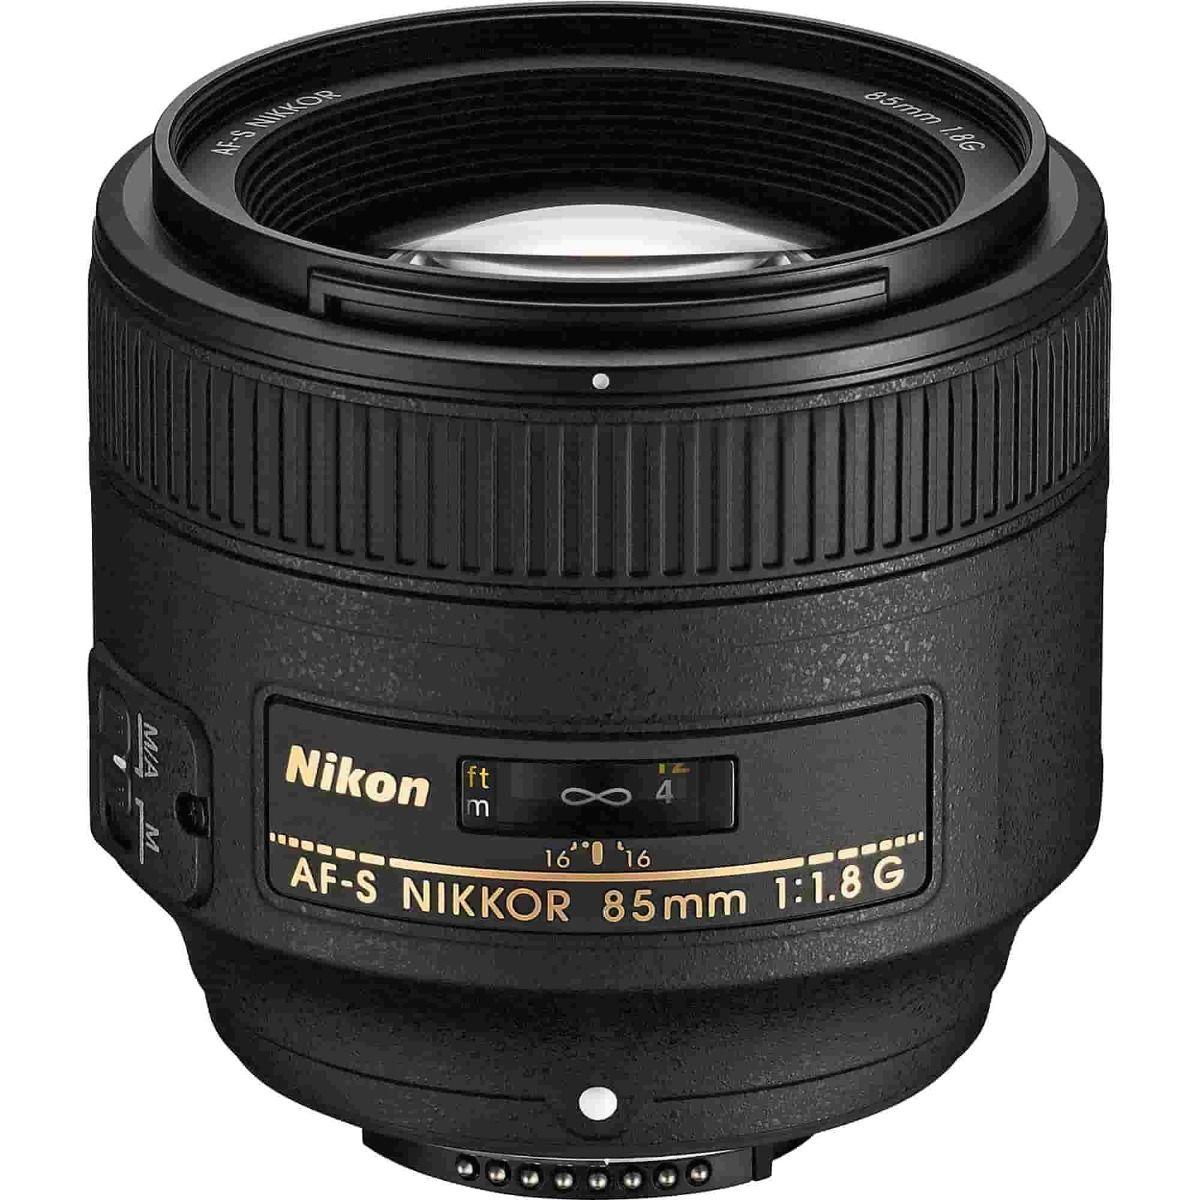 Nikon AF-S 85mm f/1.8G Lens,Nikon AF-S 85mm f/1.8G Lens,Nikon AF-S 85mm f/1.8G Lens